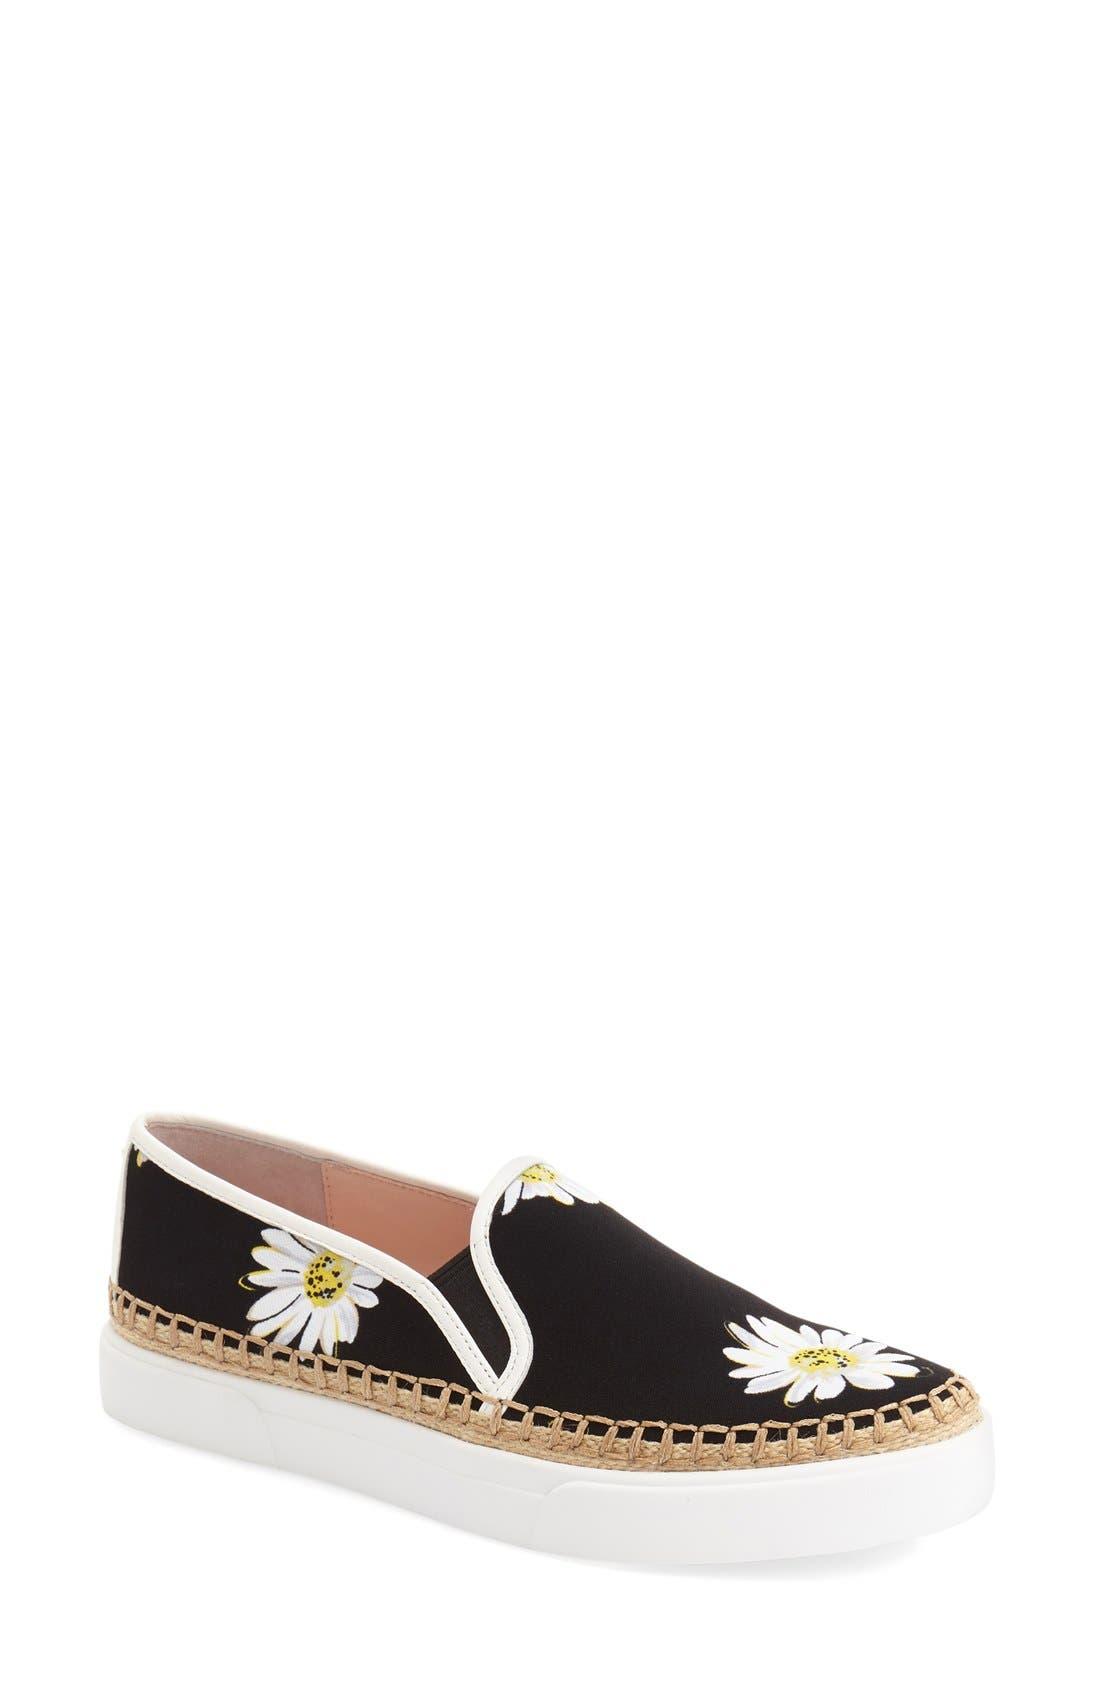 Main Image - kate spade new york 'cory' slip-on sneaker (Women)